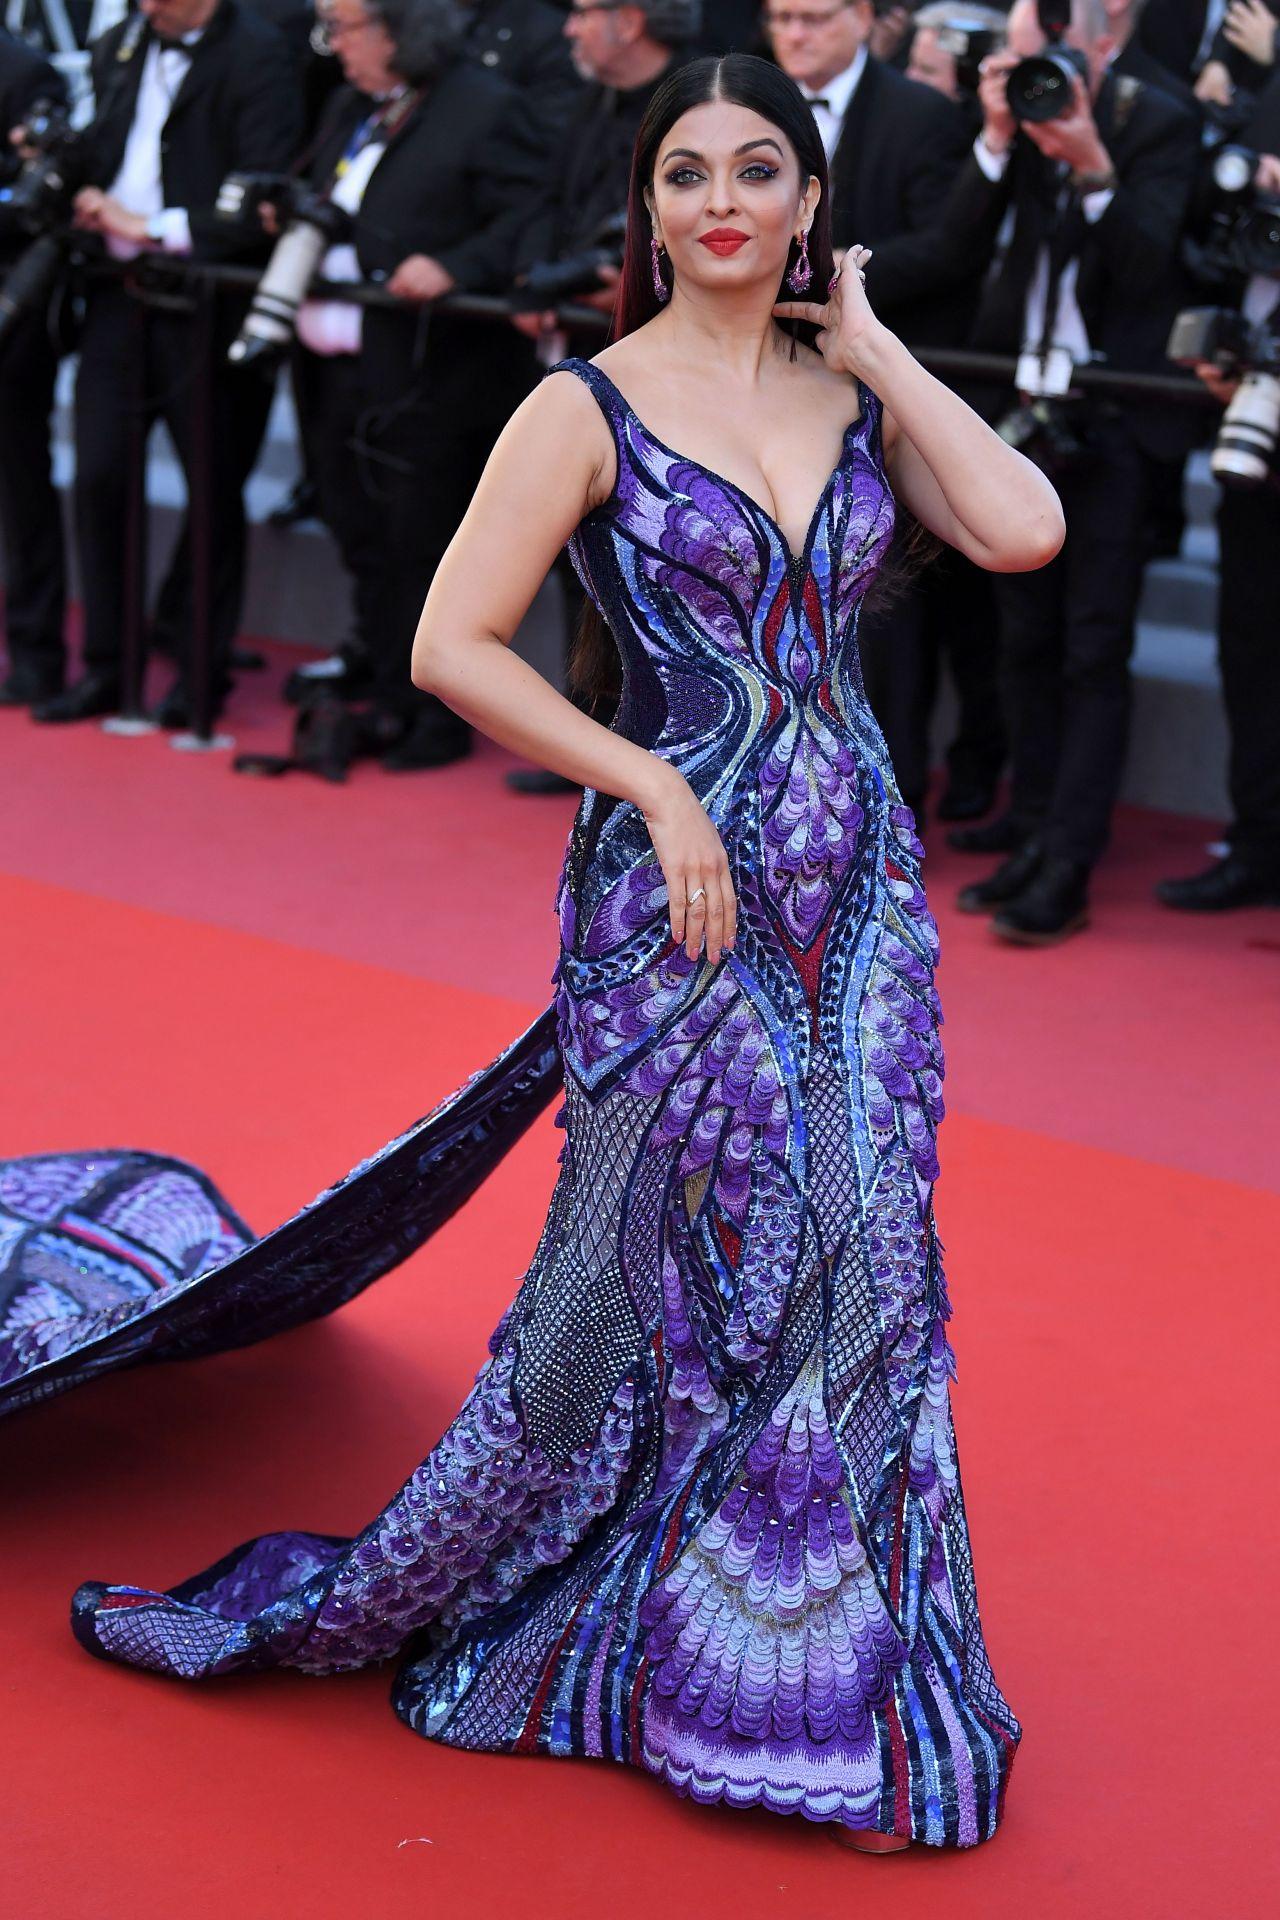 Cannes, France. 20th May 2014. Aishwarya Rai Bachchan at ... |Aishwarya Rai 2014 March